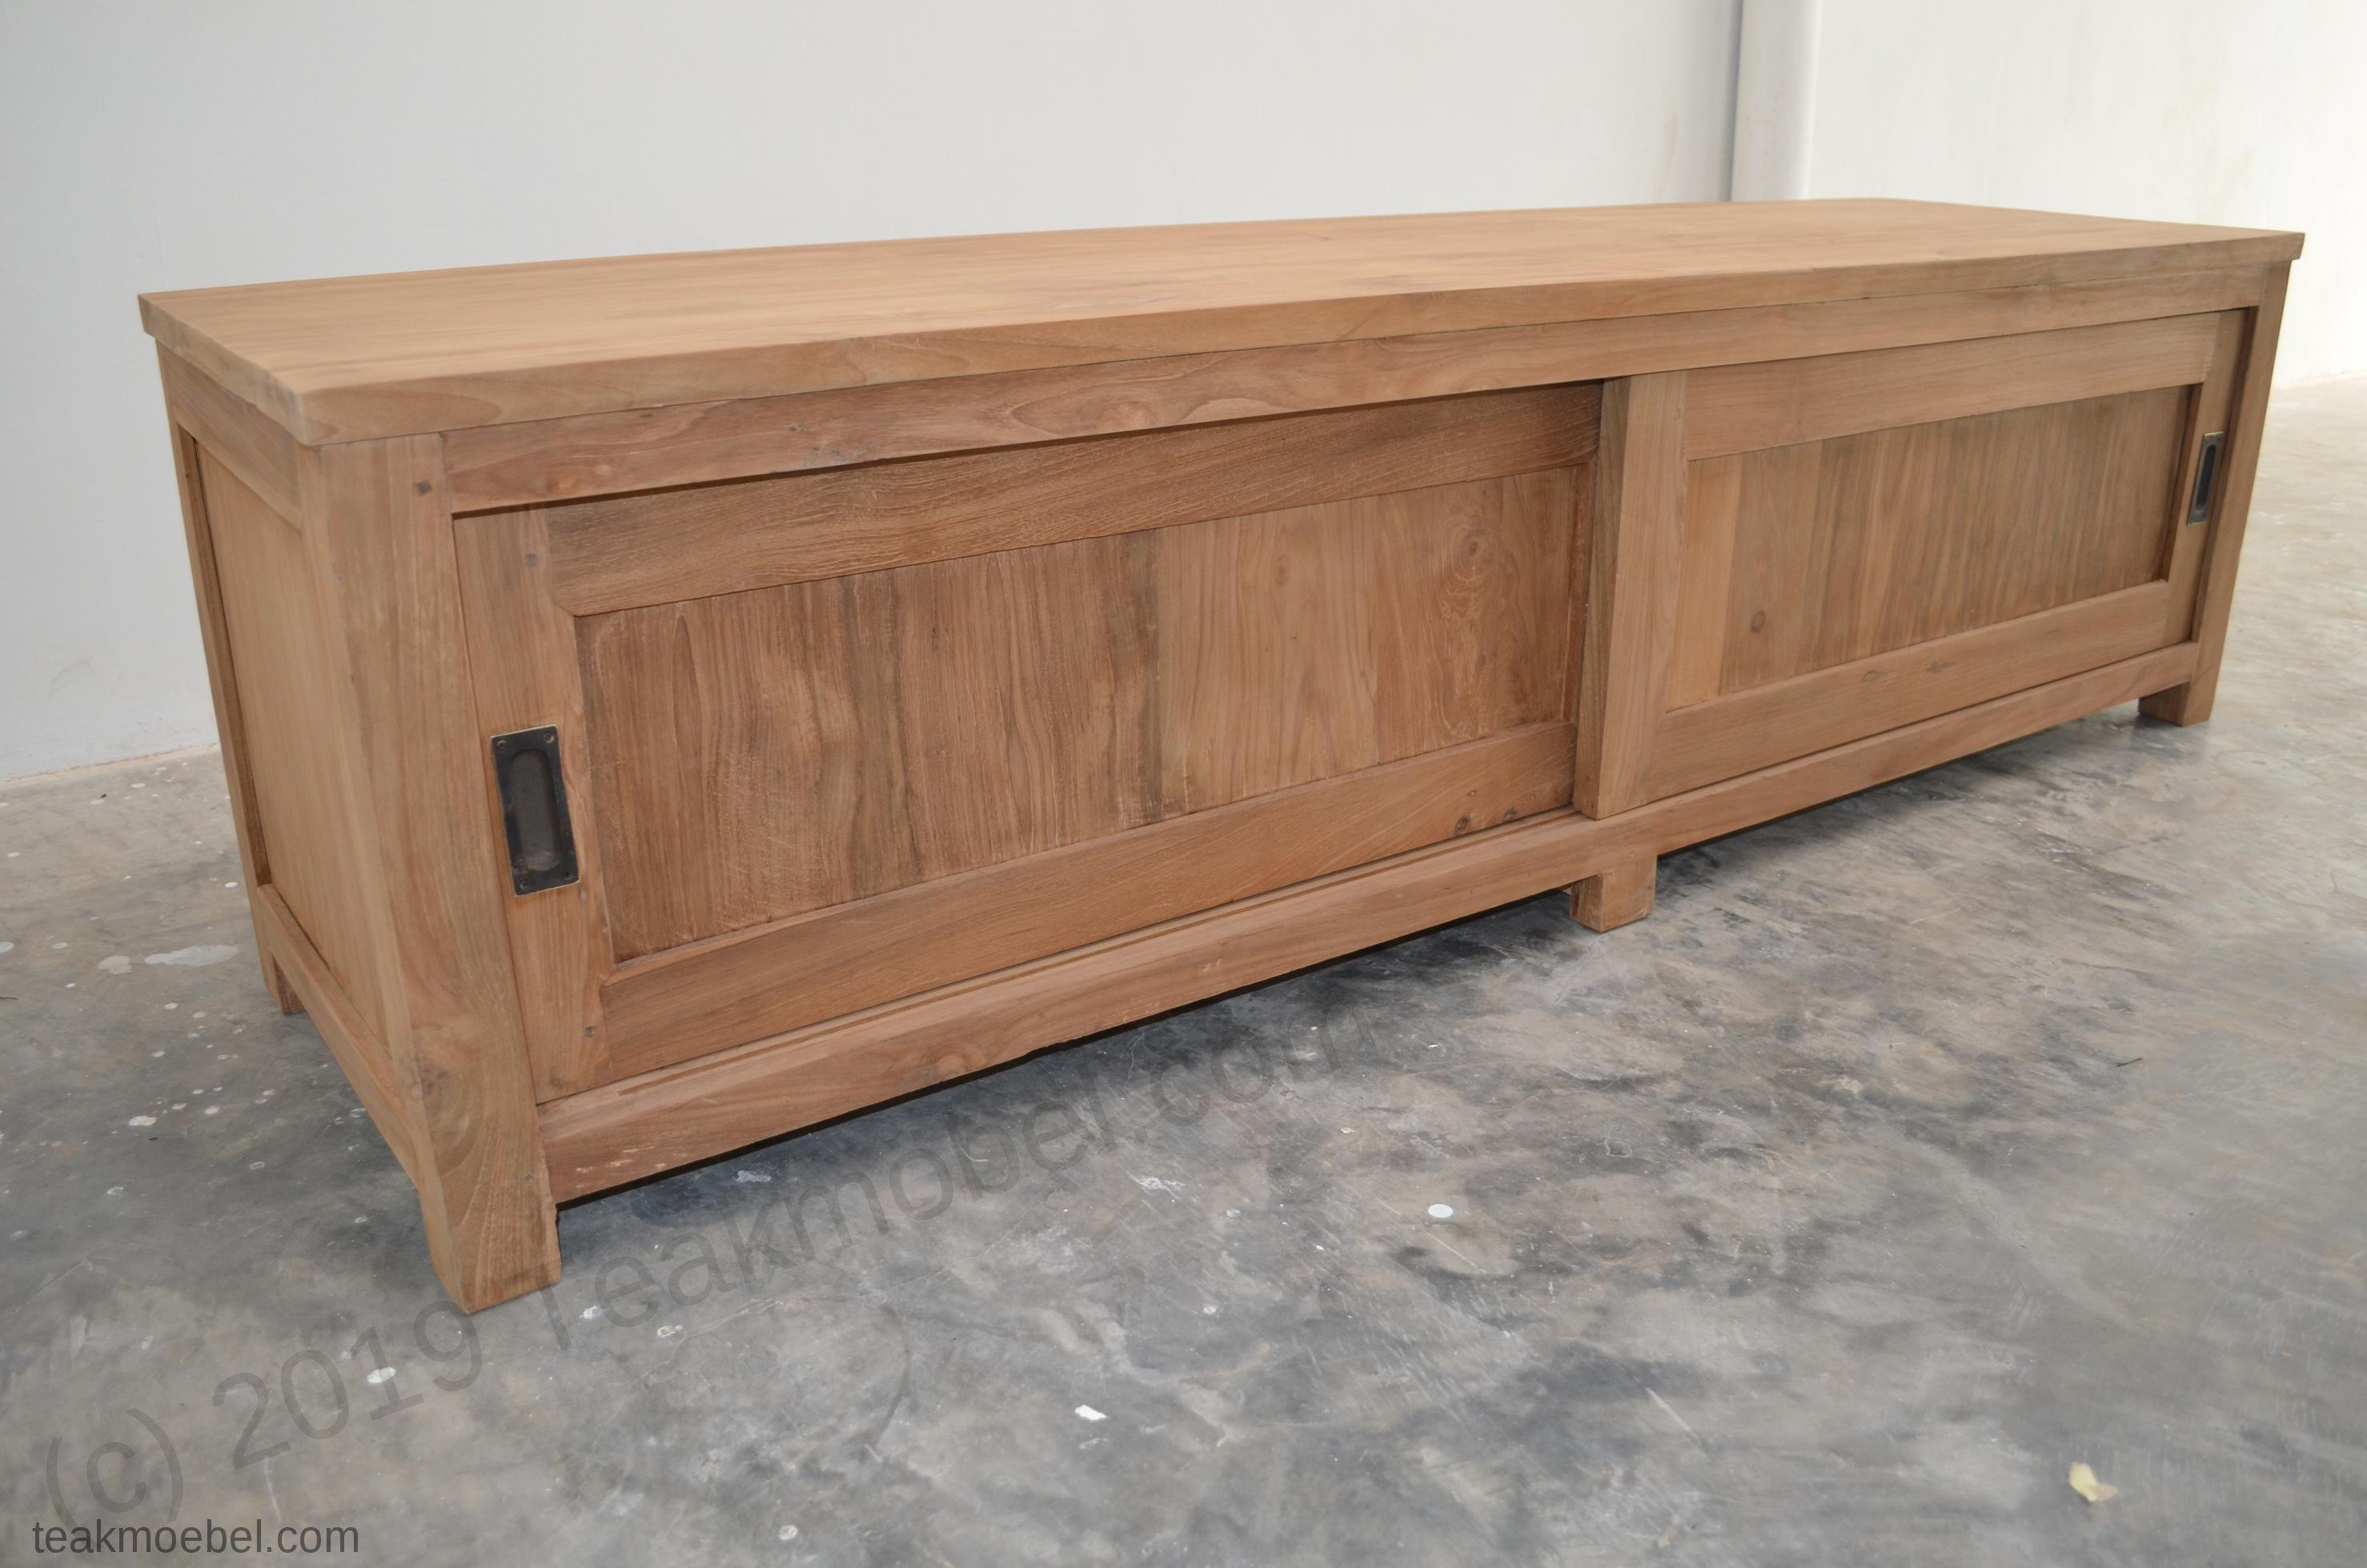 Sideboard Fernsehmöbel teak fernsehmöbel schiebetüren 180 x 50 x 50 cm teakmoebel com